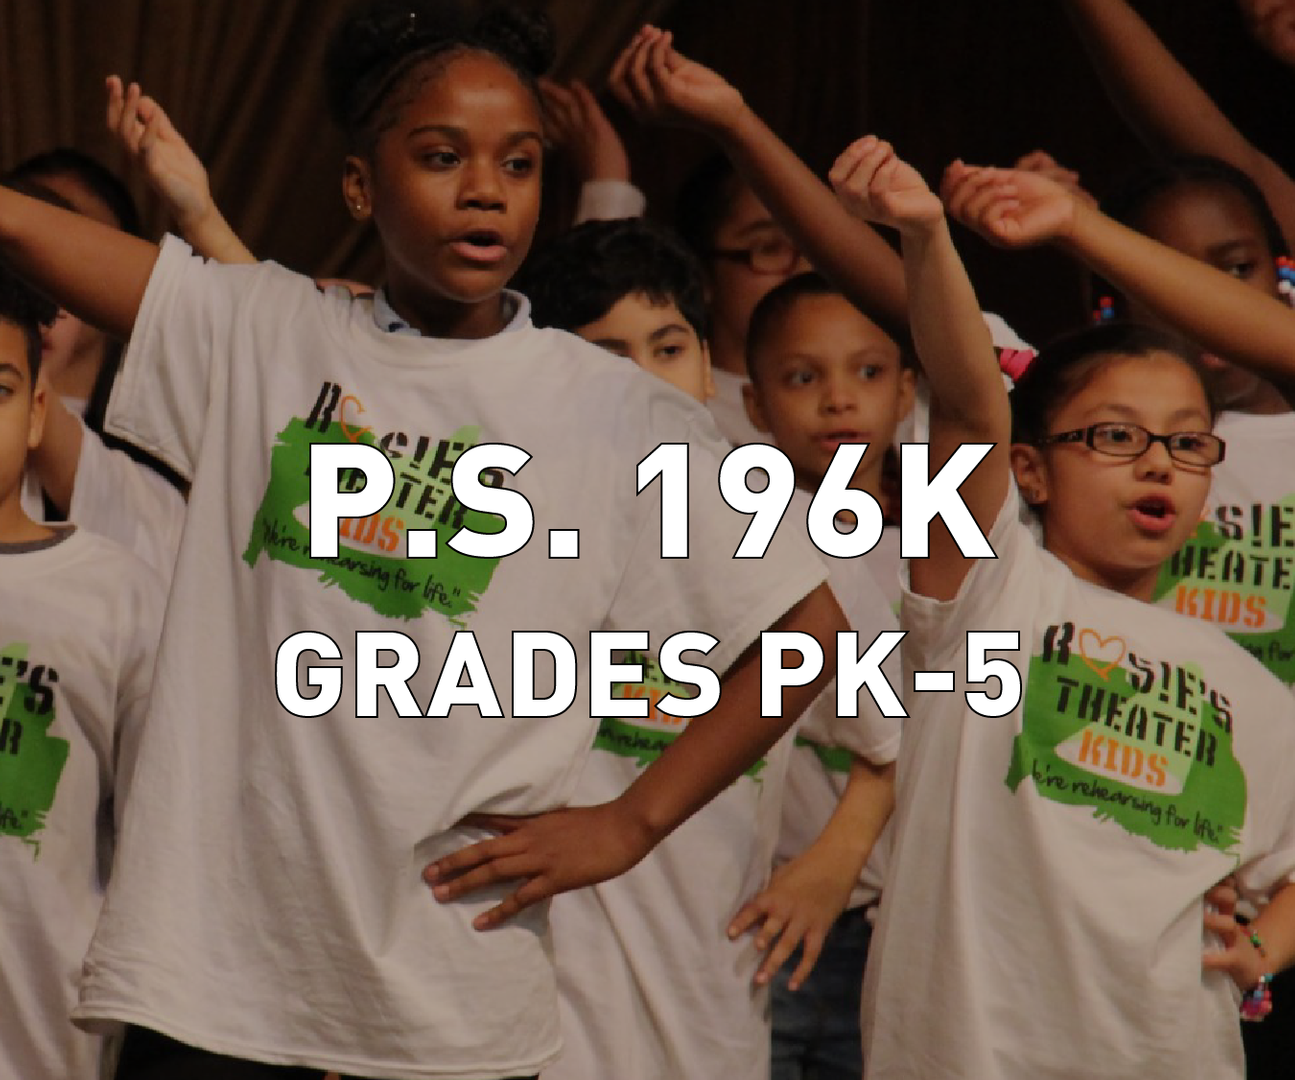 P.S. 196K Grades PK-5